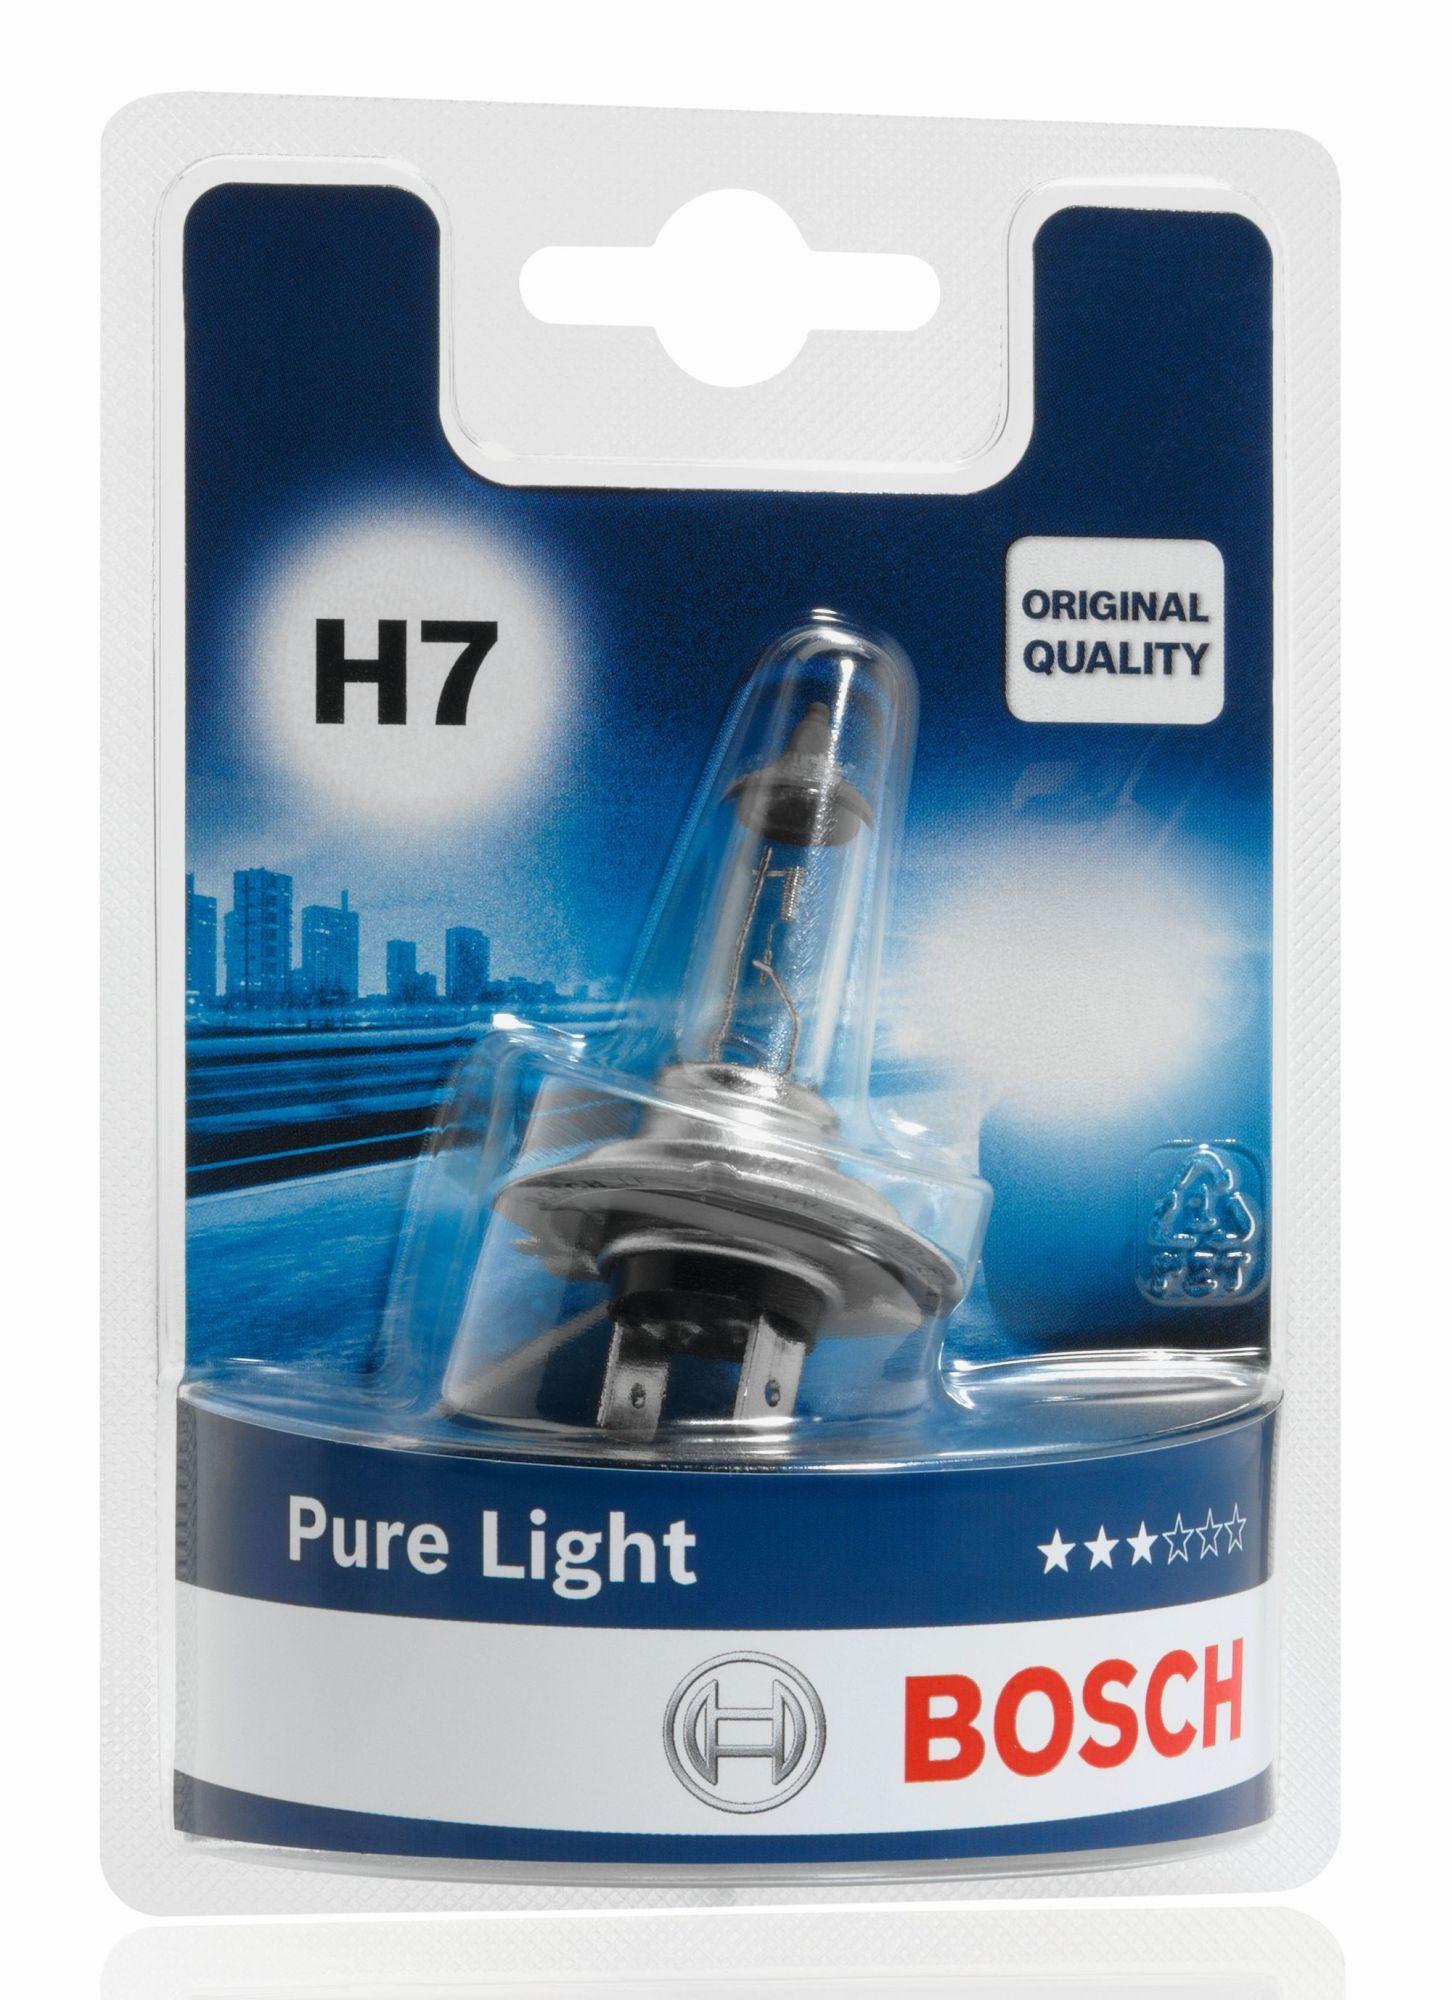 Bosch Pure Light 1987301012 H7 PX26d 12V 55W